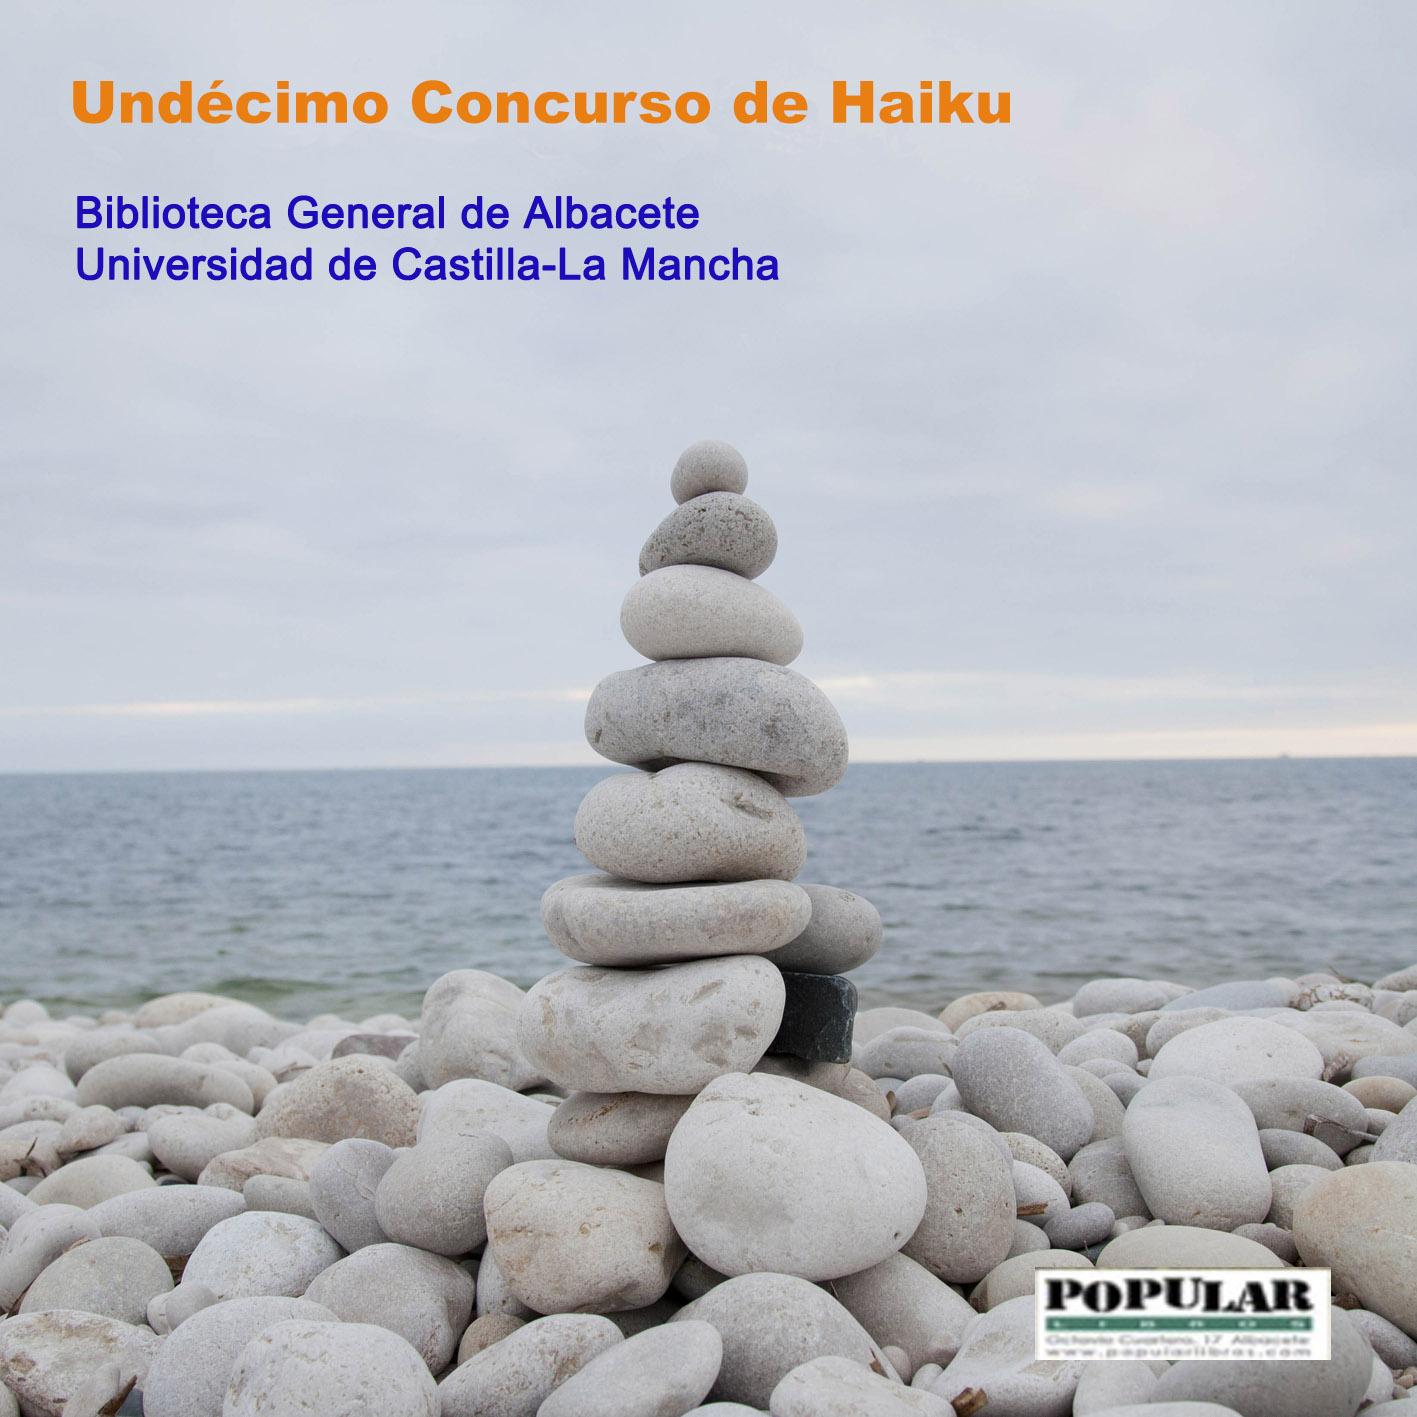 11 Concurso Haiku Biblioteca General de Albacete UCLM